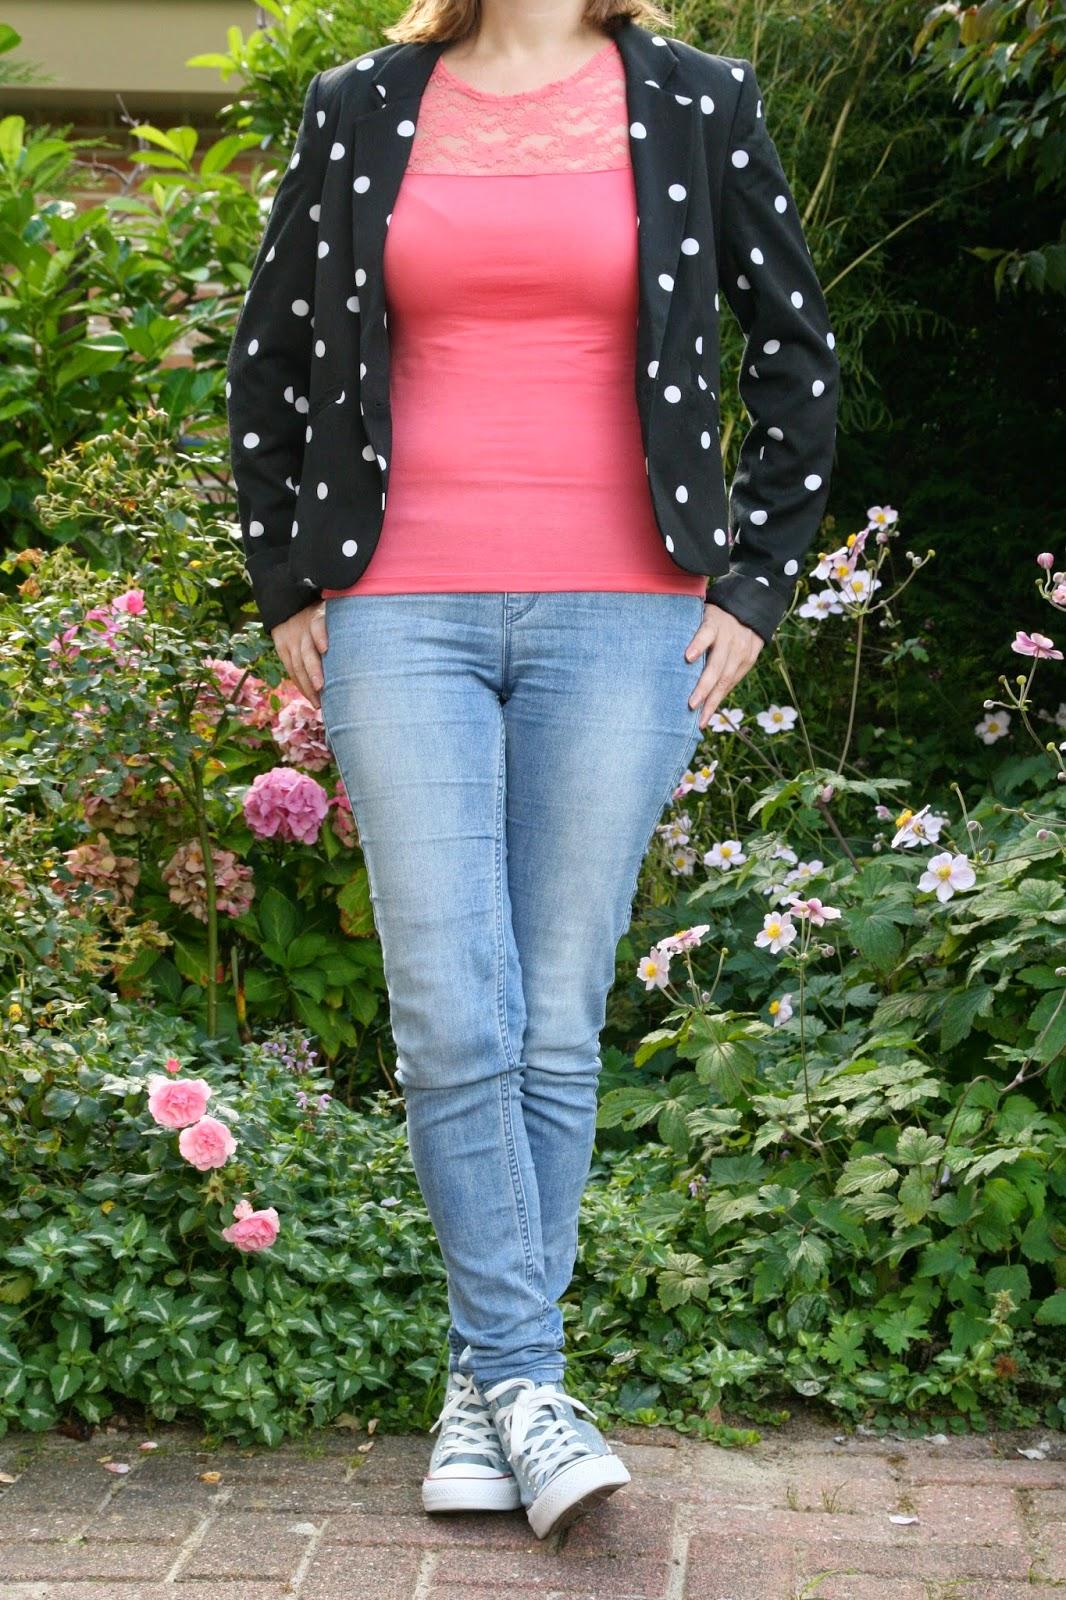 http://hmlovur.blogspot.nl/2014/09/outfits-of-week-week-36.html